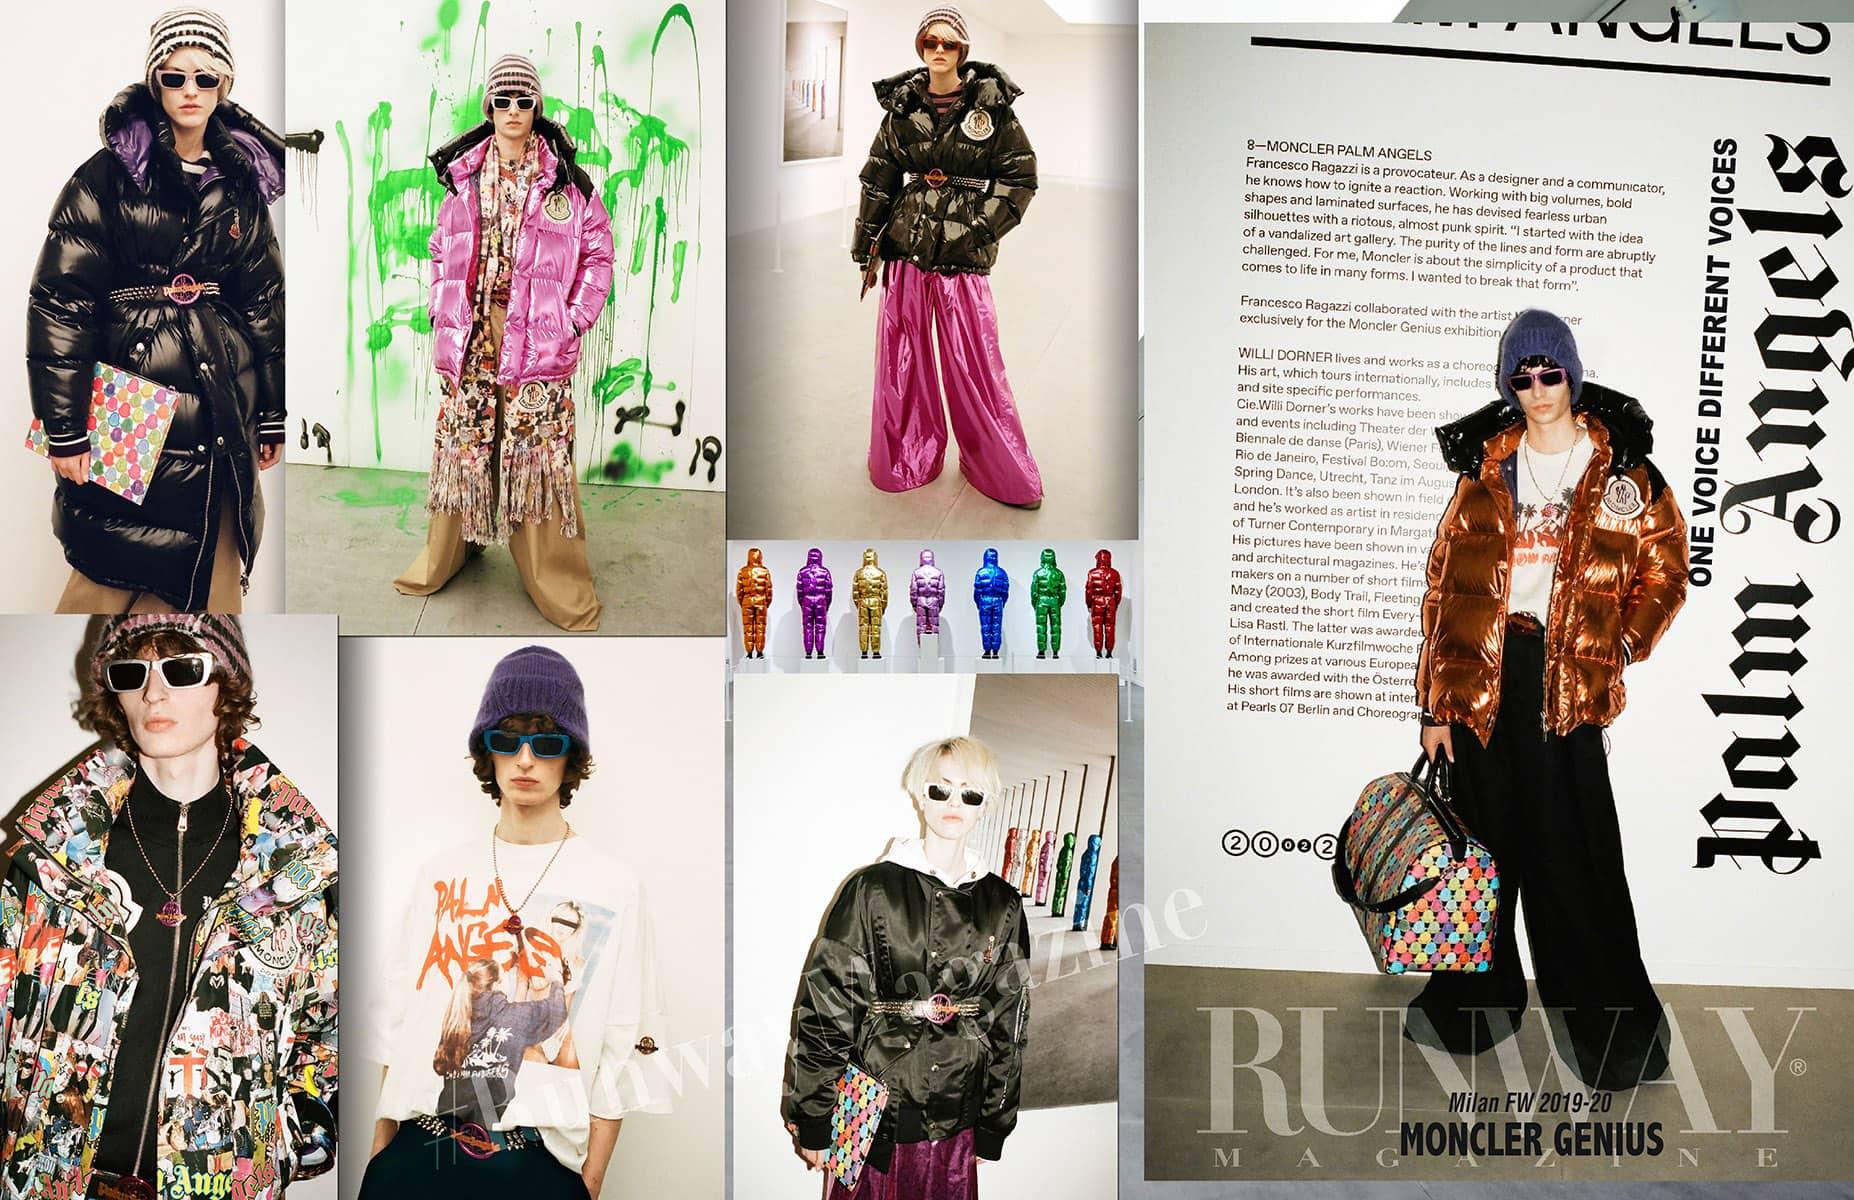 Moncler Genius Fall-Winter 2019-2020 Milan - Designer Palm Angels by Runway Magazine